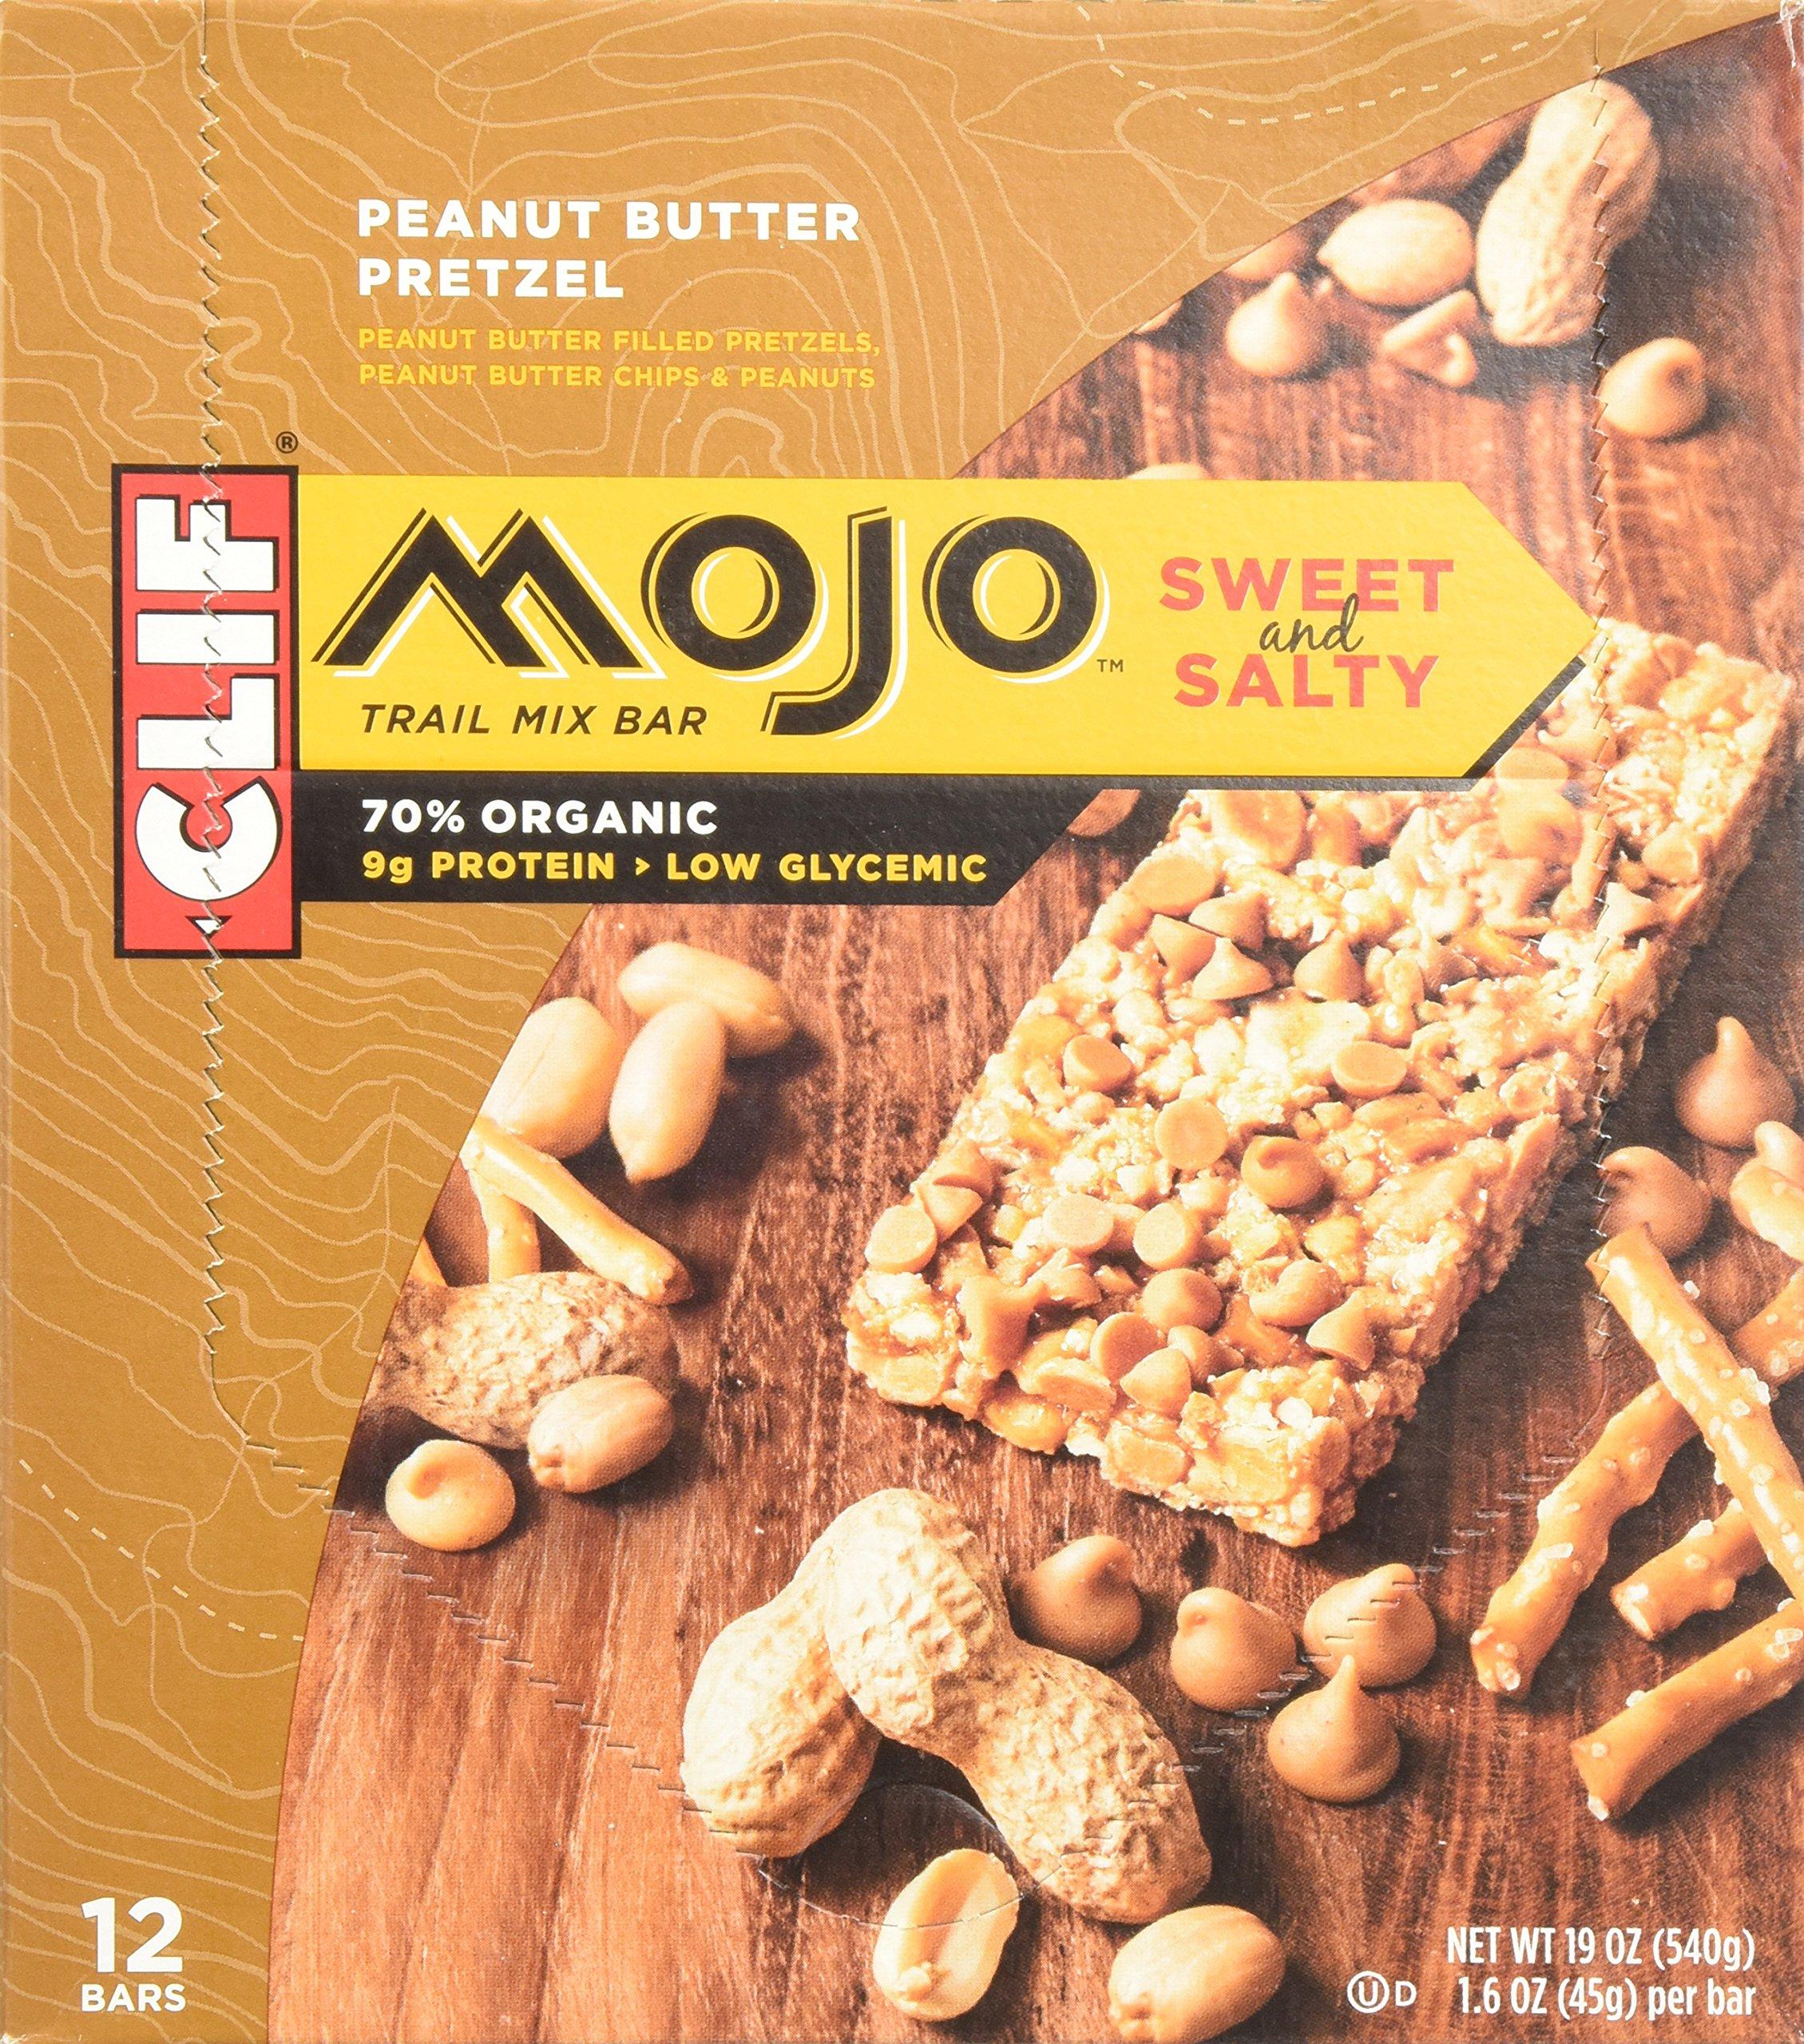 Clif Mojo Bar, Peanut Butter Pretzel, Net Wt. 19.08 Oz. 12 Count (Pack of 2) by Clif Bar